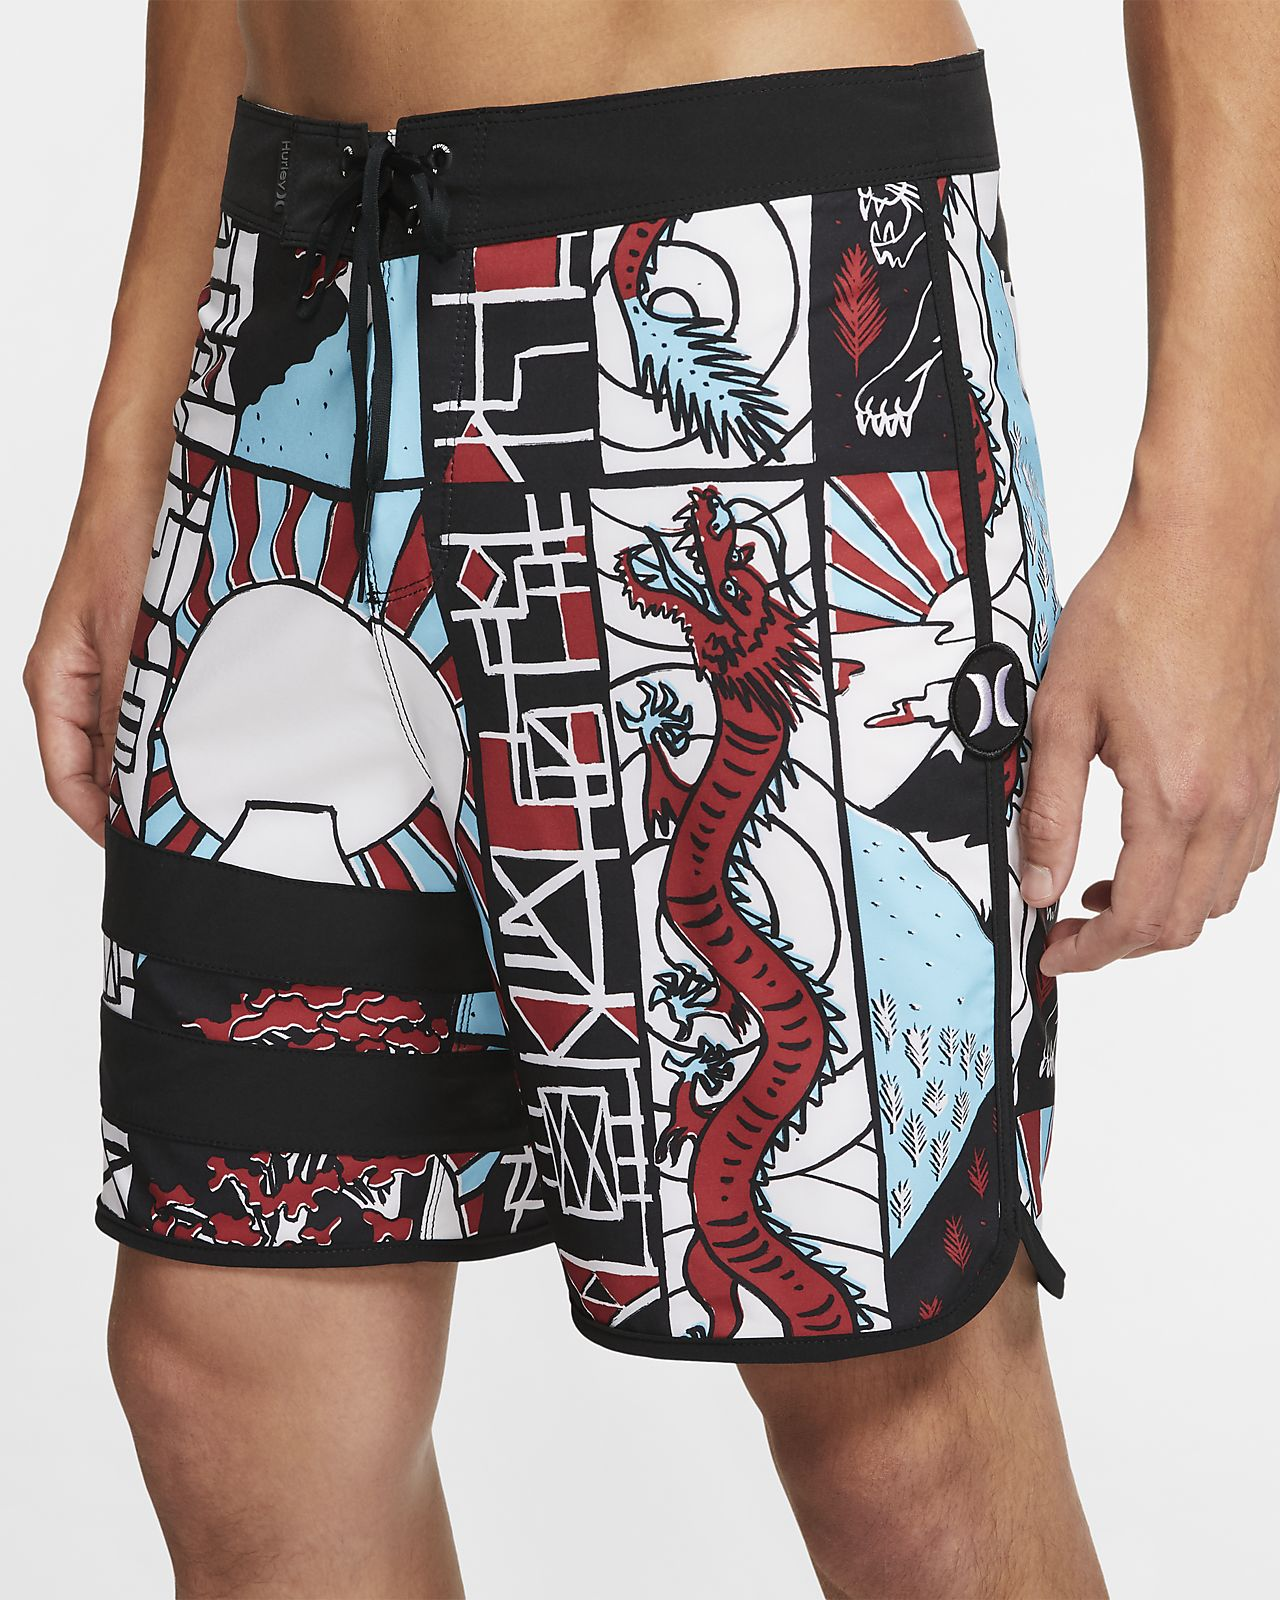 Shorts de playa de 46 cm para hombre Hurley Phantom Block Party Yabai